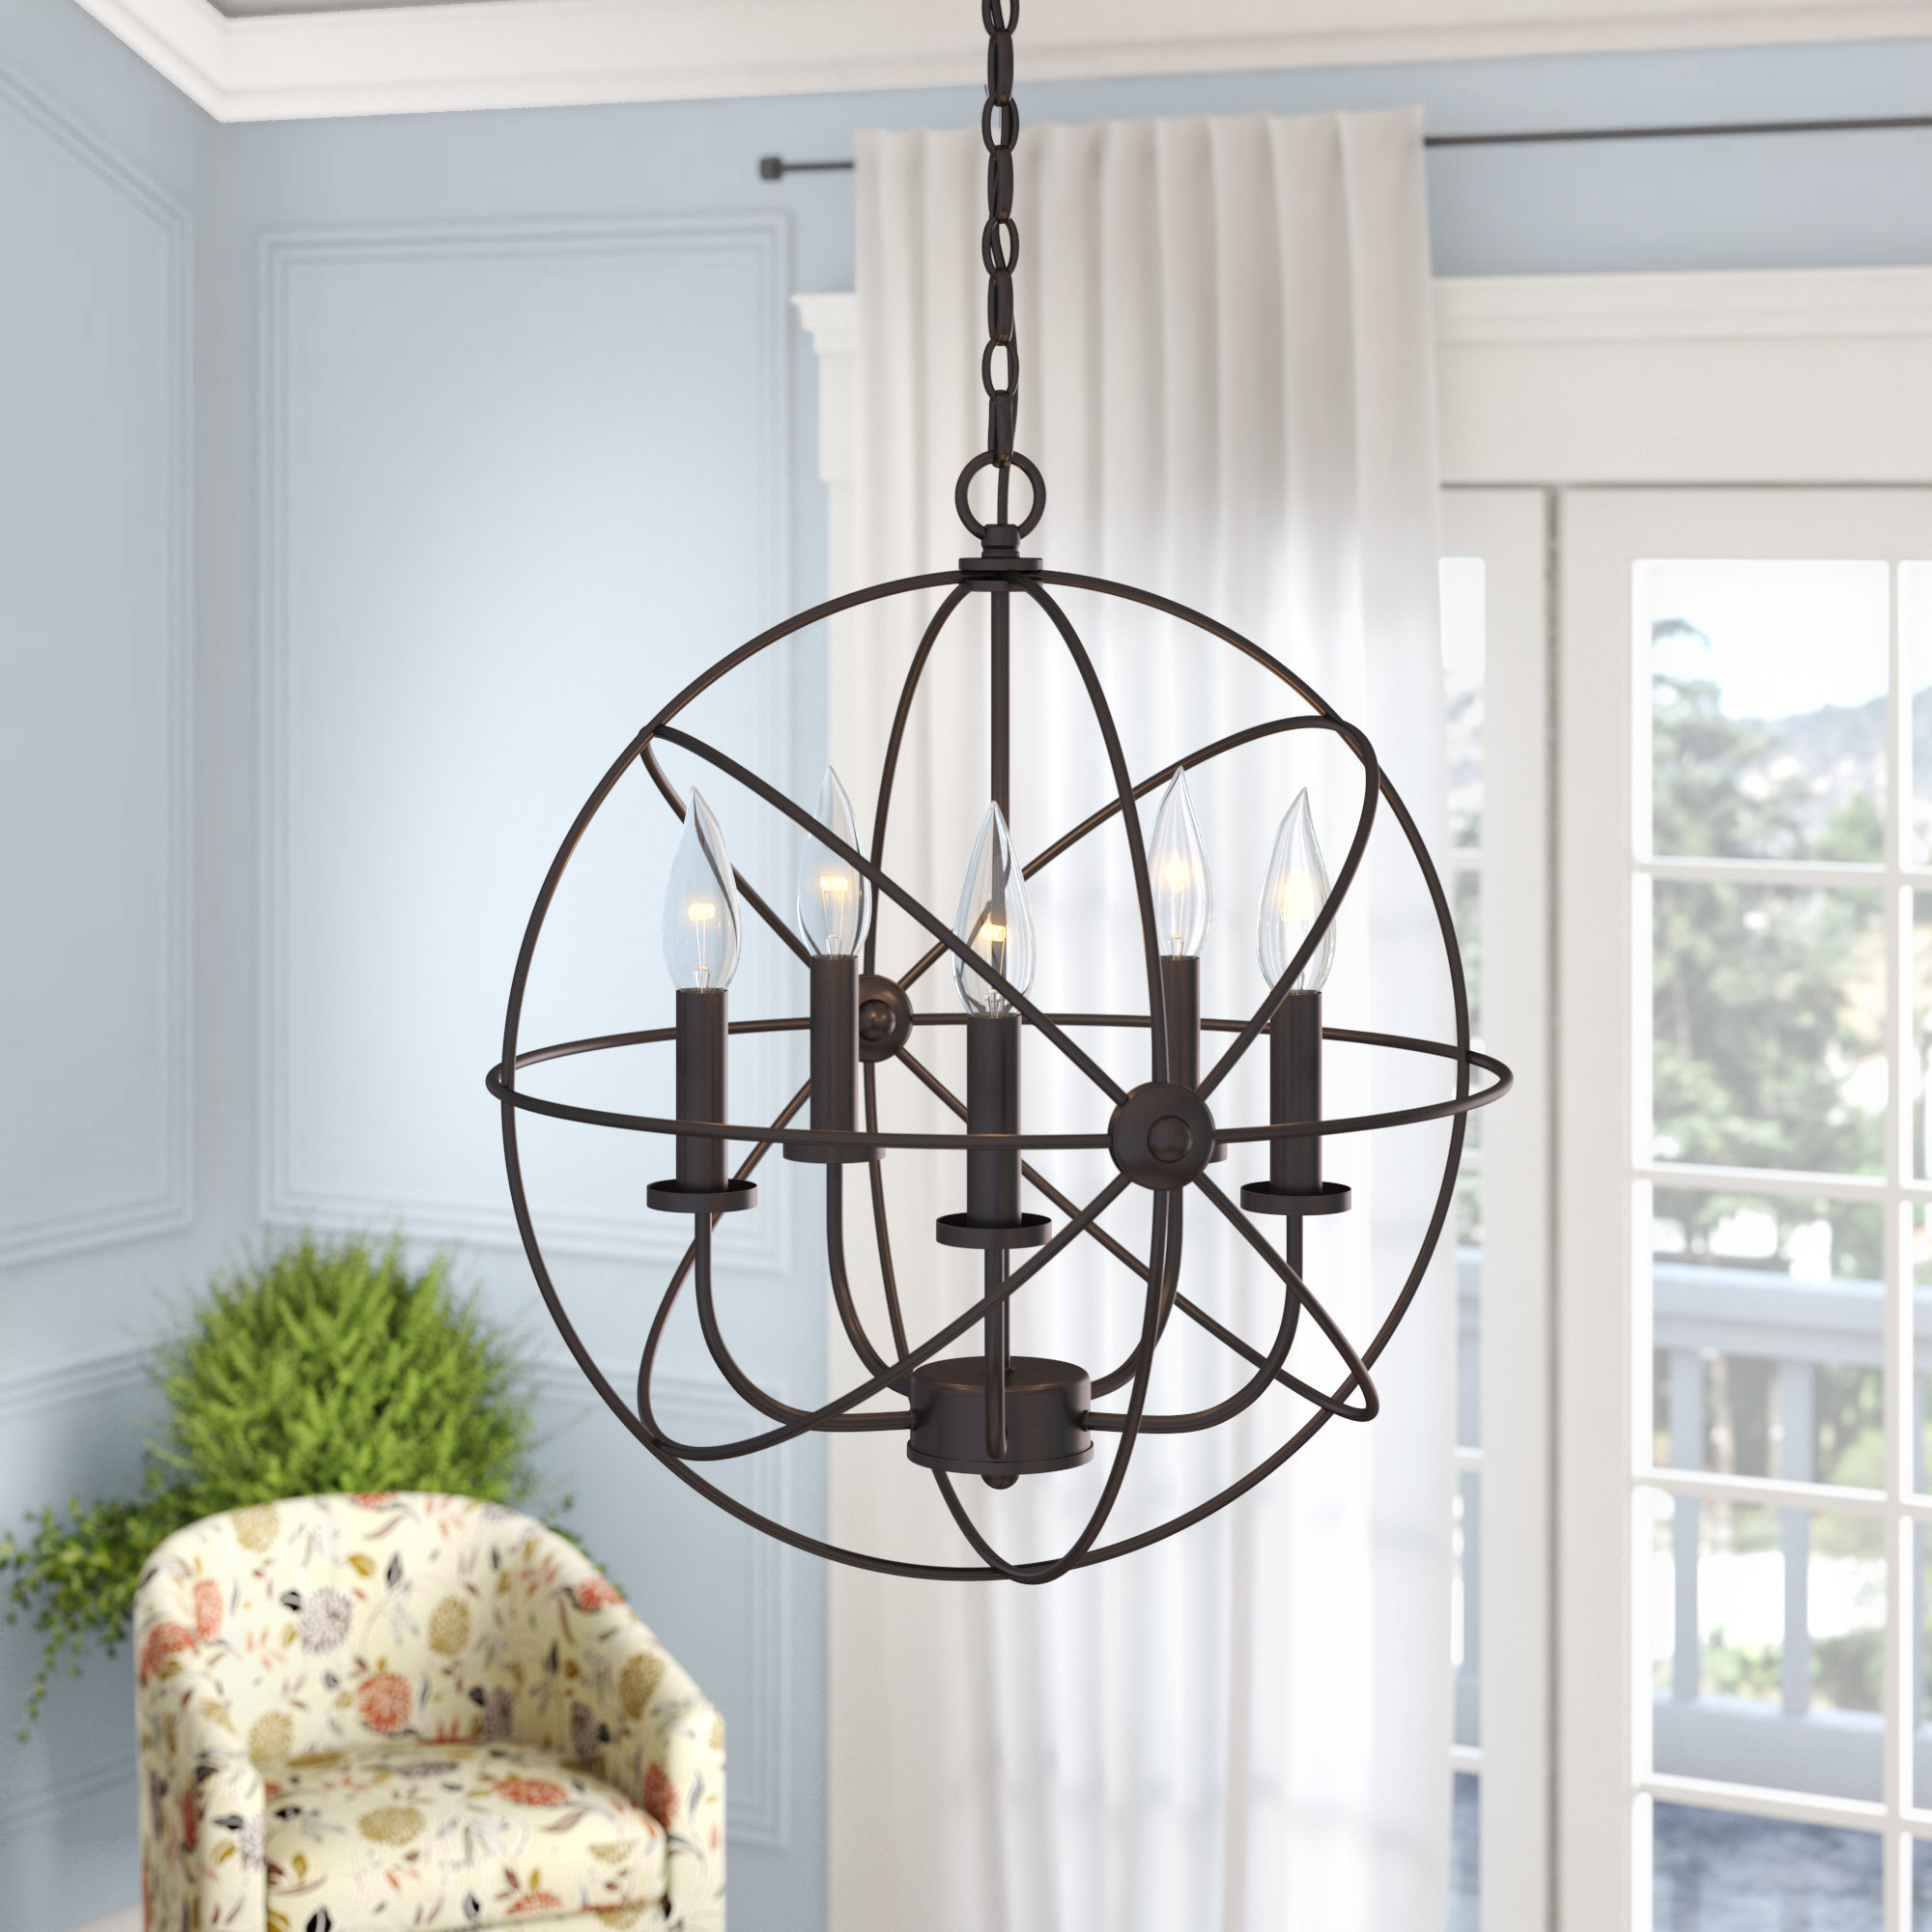 Famous Verlene Foyer 5 Light Globe Chandeliers Within Caius 5 Light Globe Chandelier (View 10 of 25)